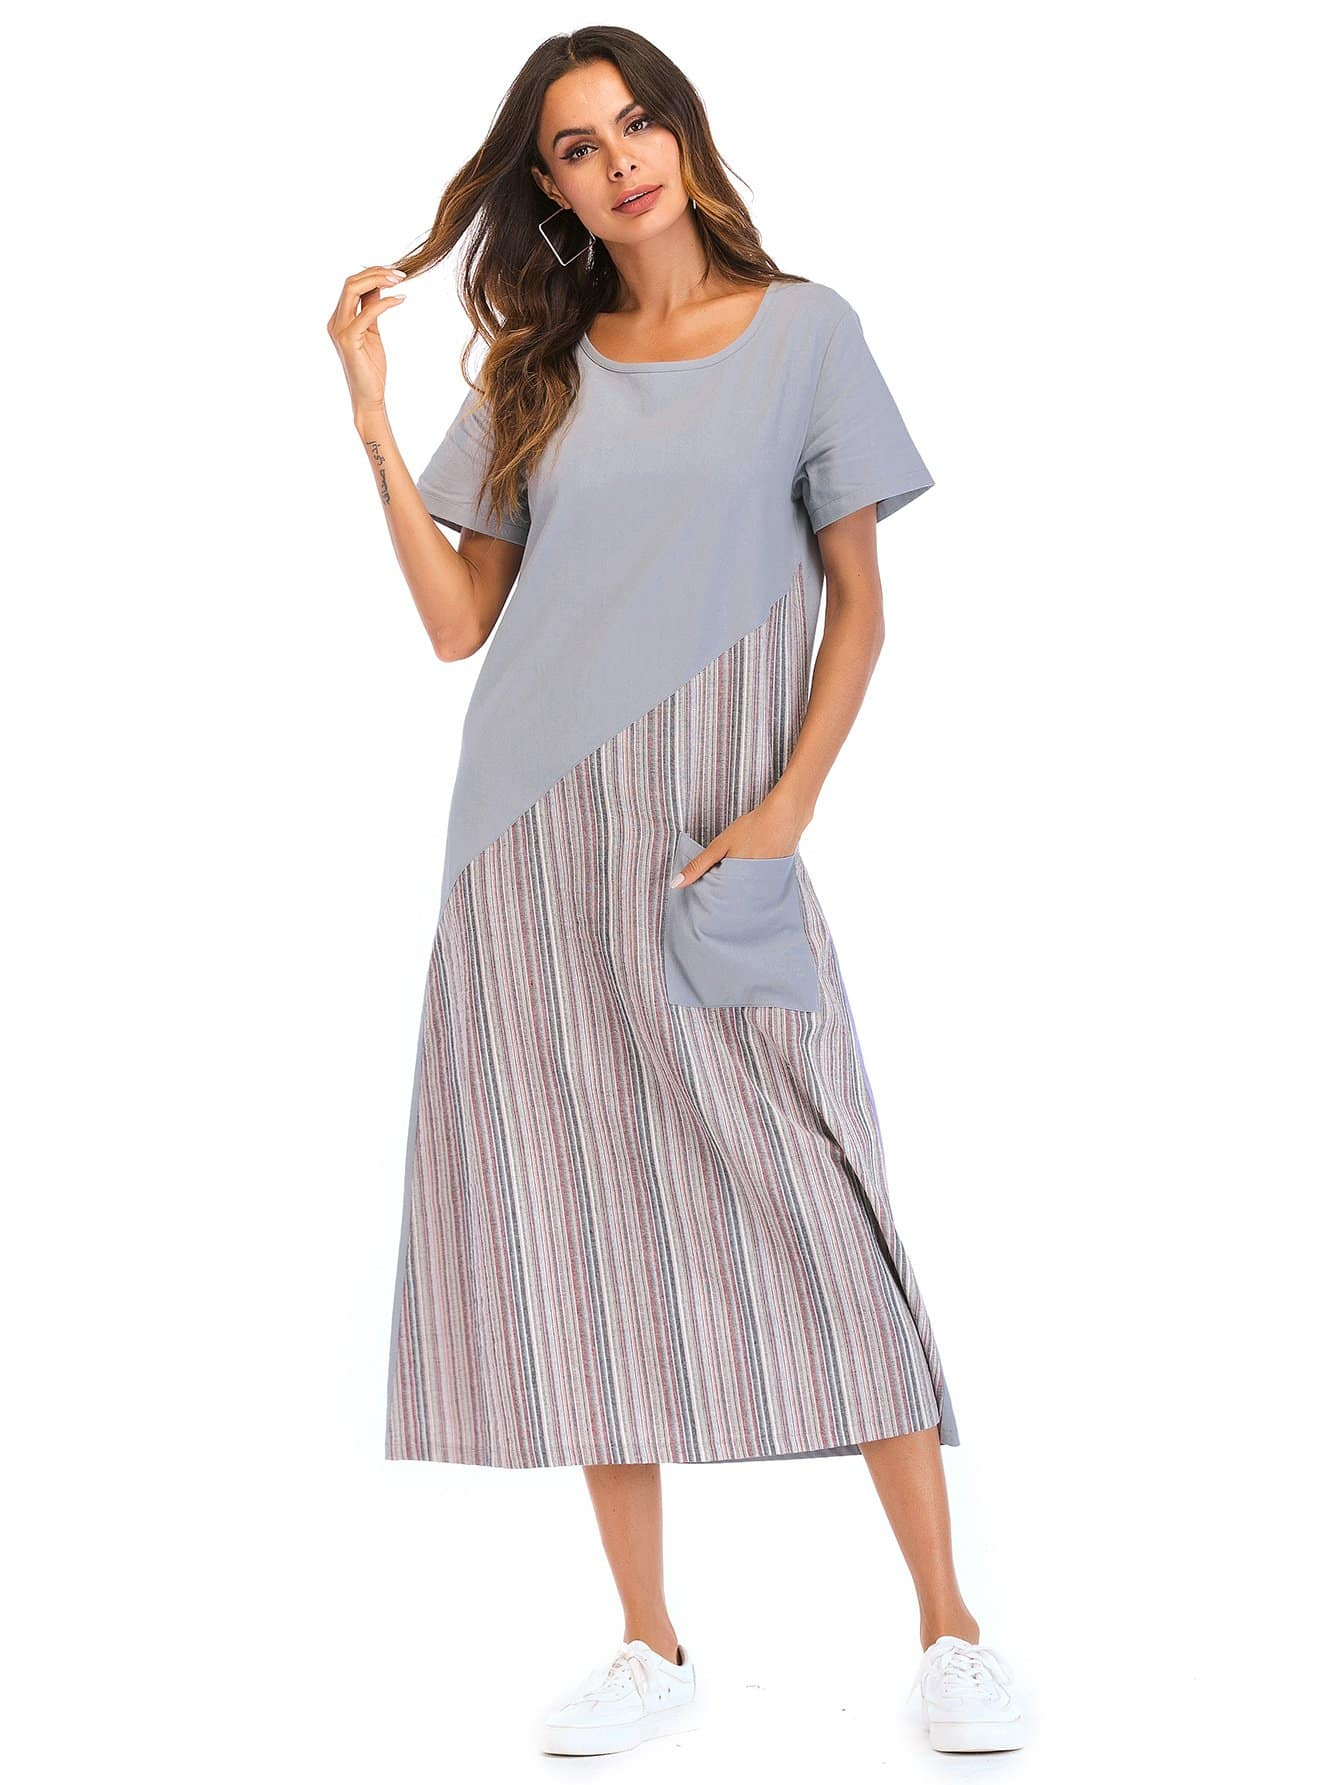 Stripe Contrast Pocket Front Longline Dress contrast collar foldover front dress